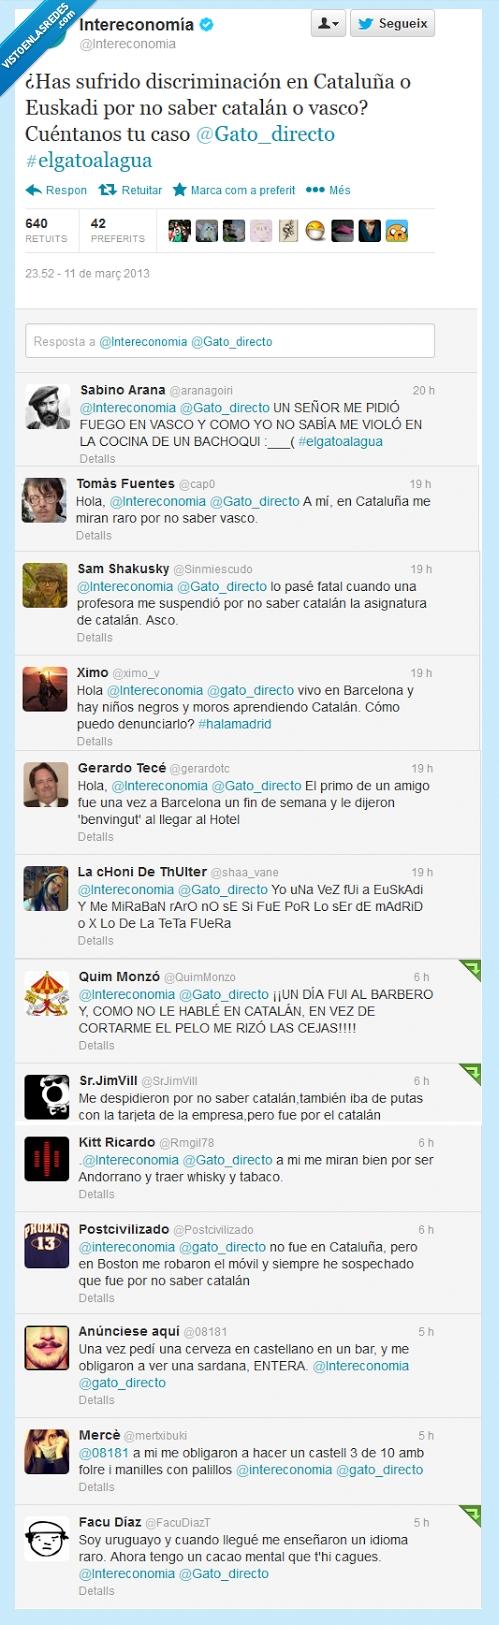 twitter intereconomia has sufrido discriminacion en cataluña o euskadi por no saber catalan o vasco respuestas